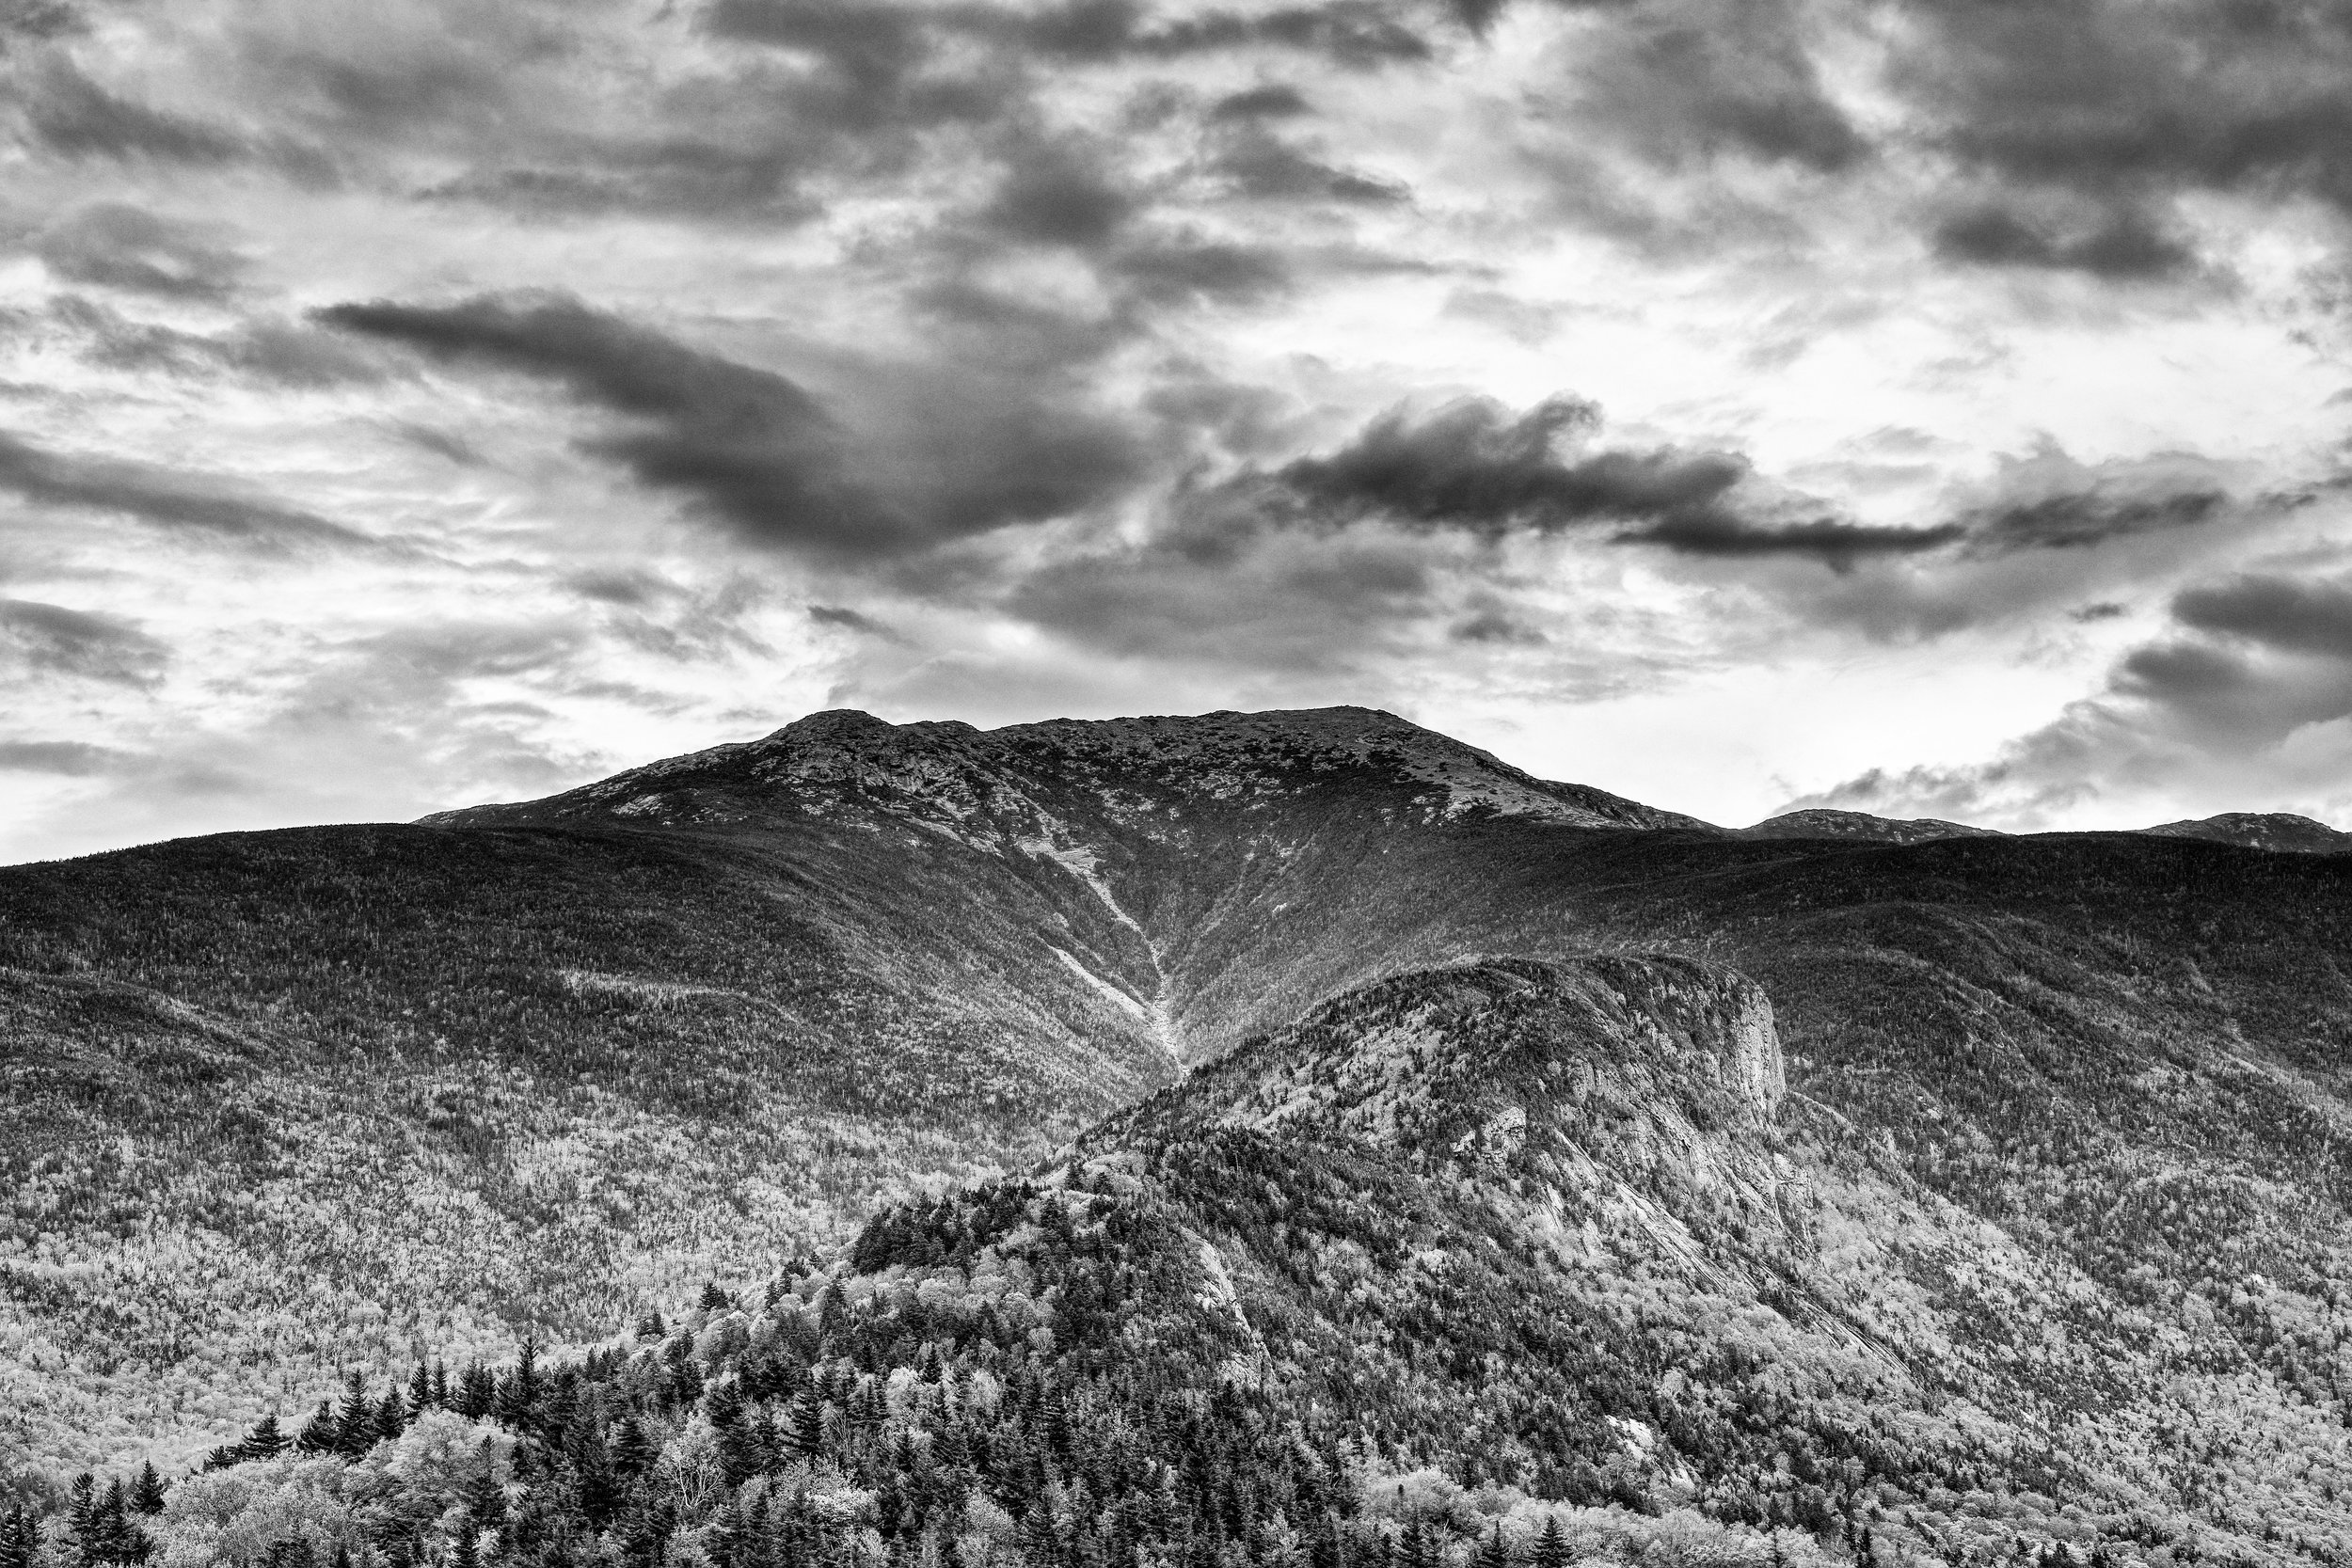 Mount Lafayette at White Mountains